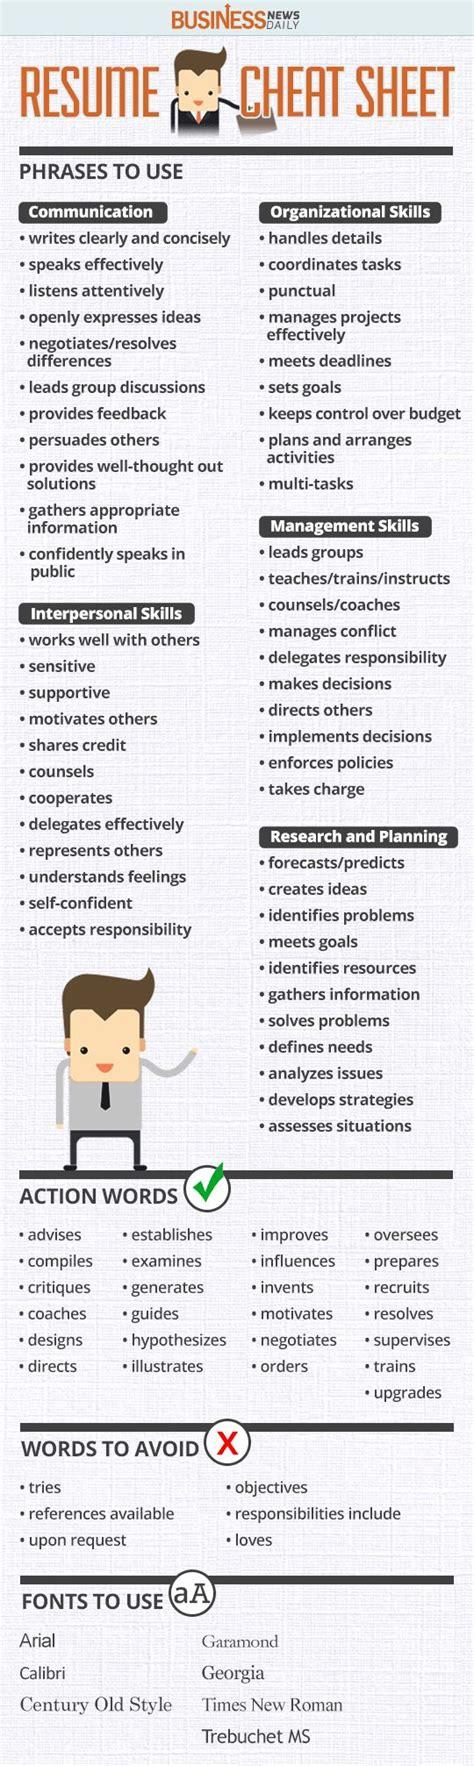 resume sheet infographic weknowmemes